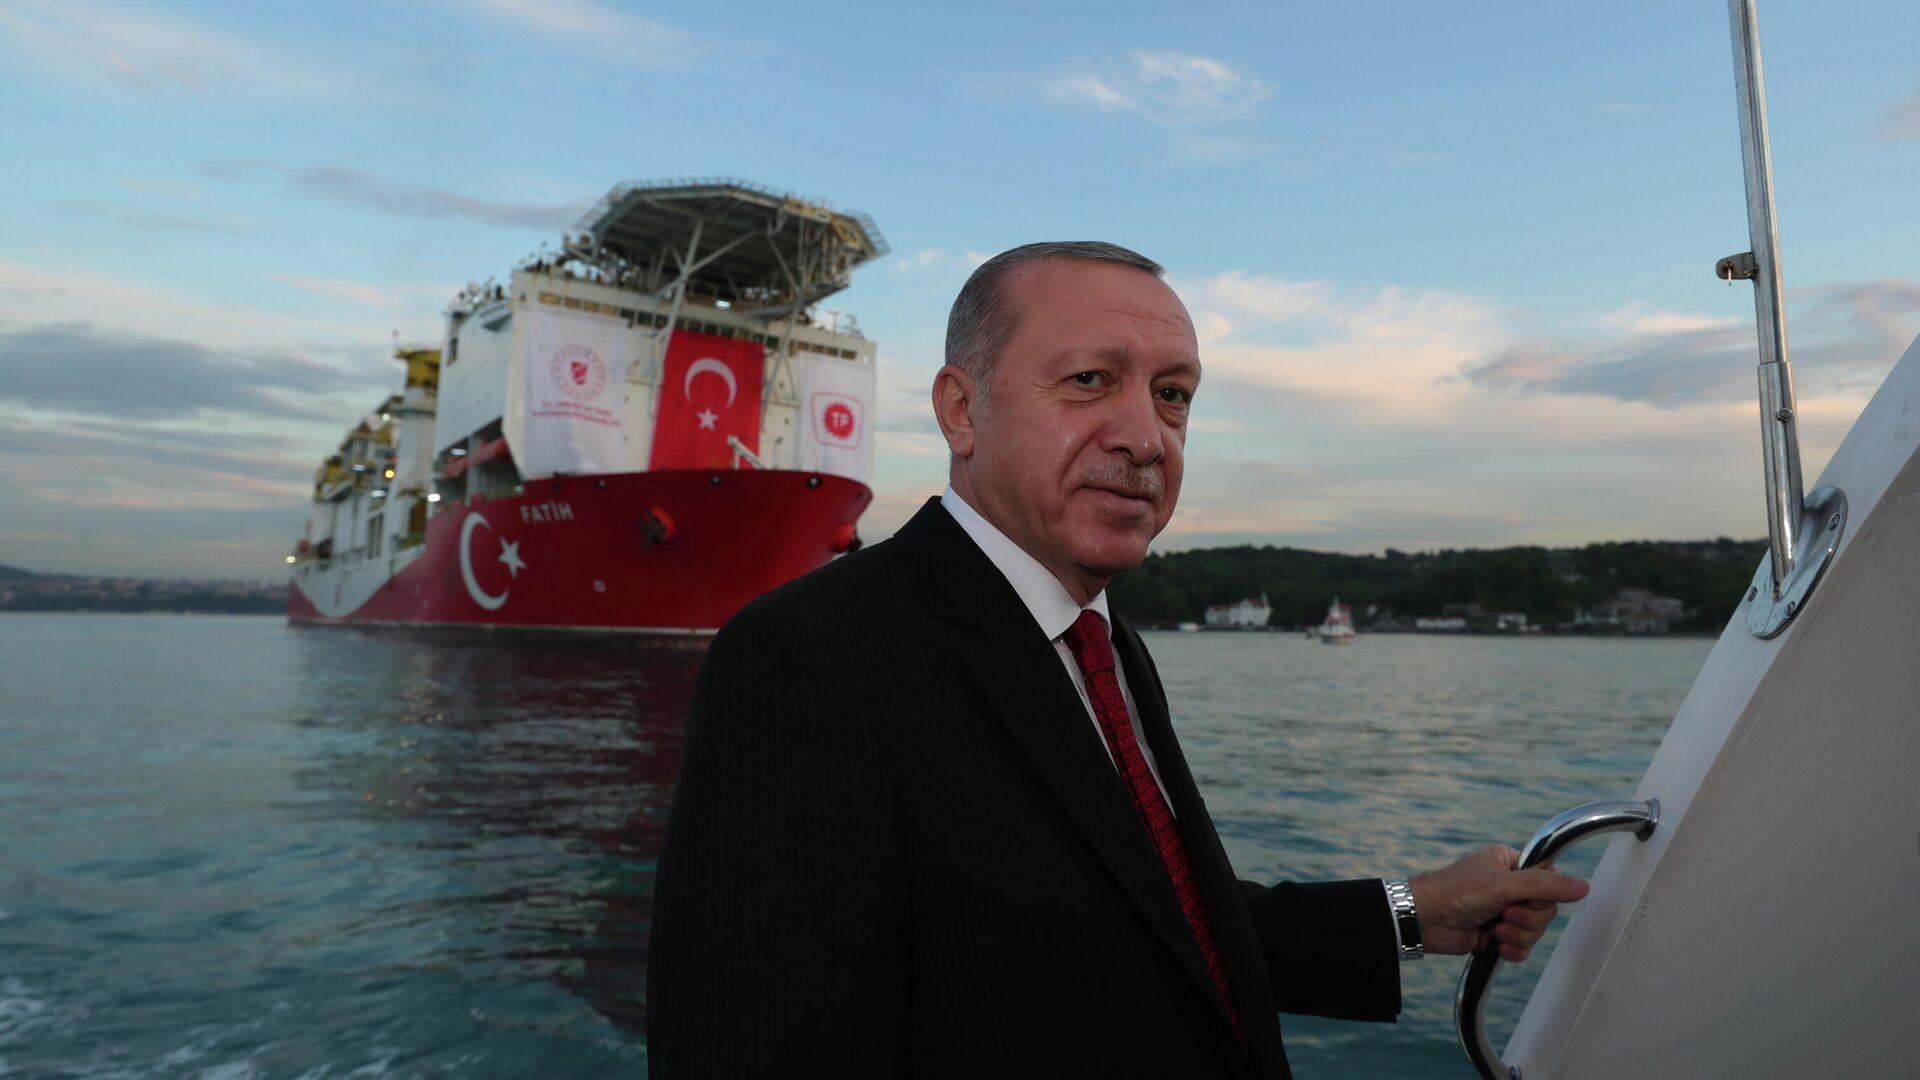 Президент Турции Реджеп Тайип Эрдоган на фоне турецкого корабля Фатих, проходящего пролив Босфор в Стамбуле - РИА Новости, 1920, 27.04.2021